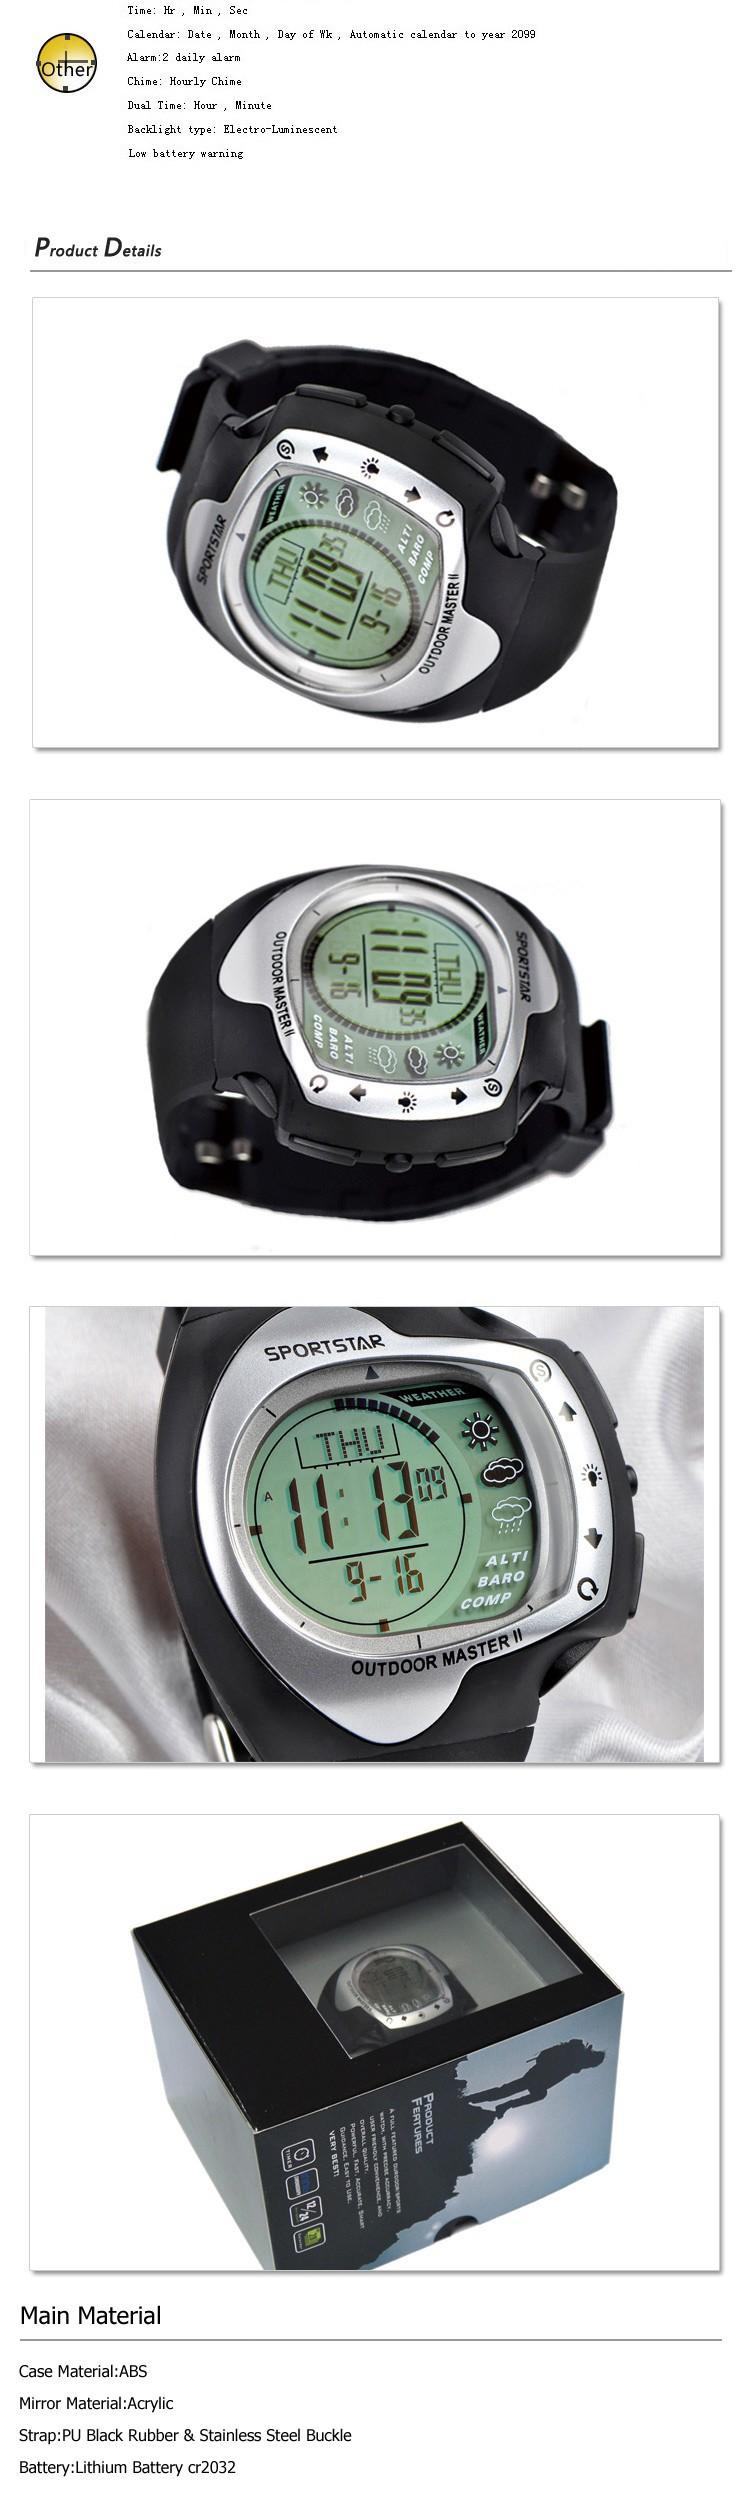 SPORTSTAR Открытый Мастер 2 профессия открытый высотомер, термометр, прогноз погоды смарт спорт наручные часы